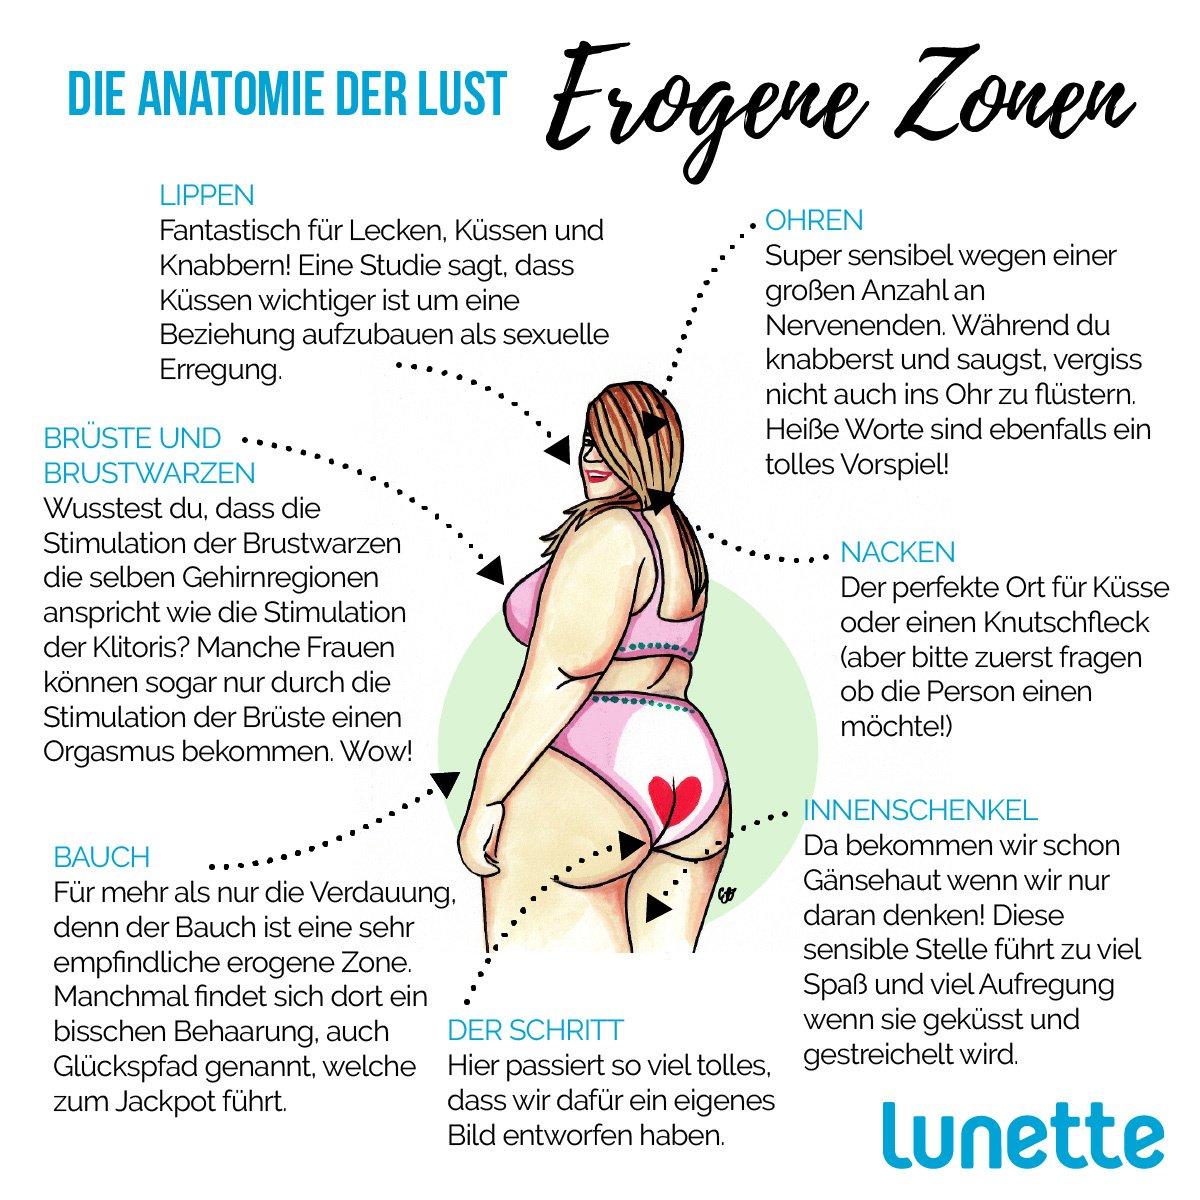 Lunette Menstruation on Twitter: \